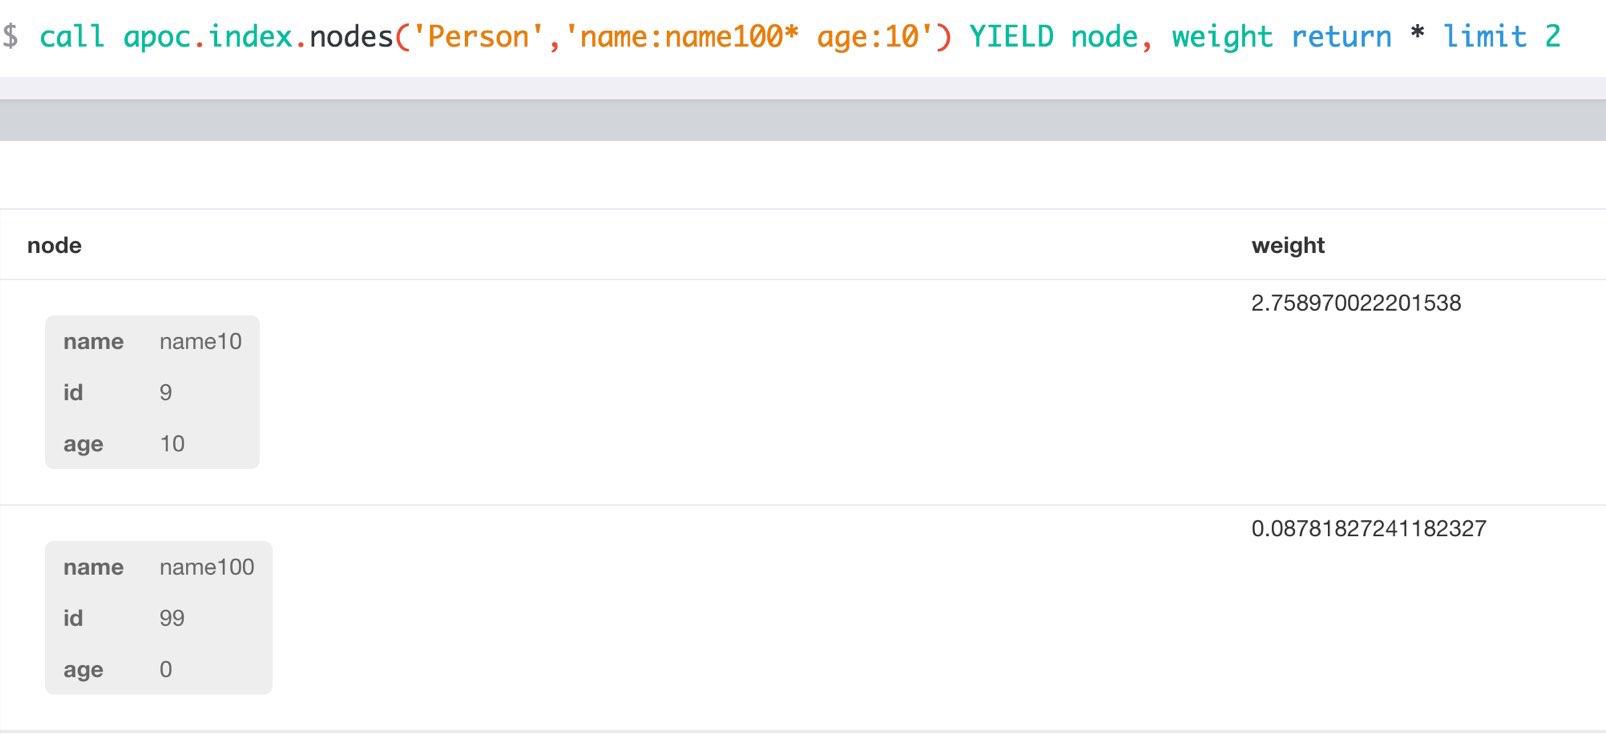 apoc.index.nodes with score